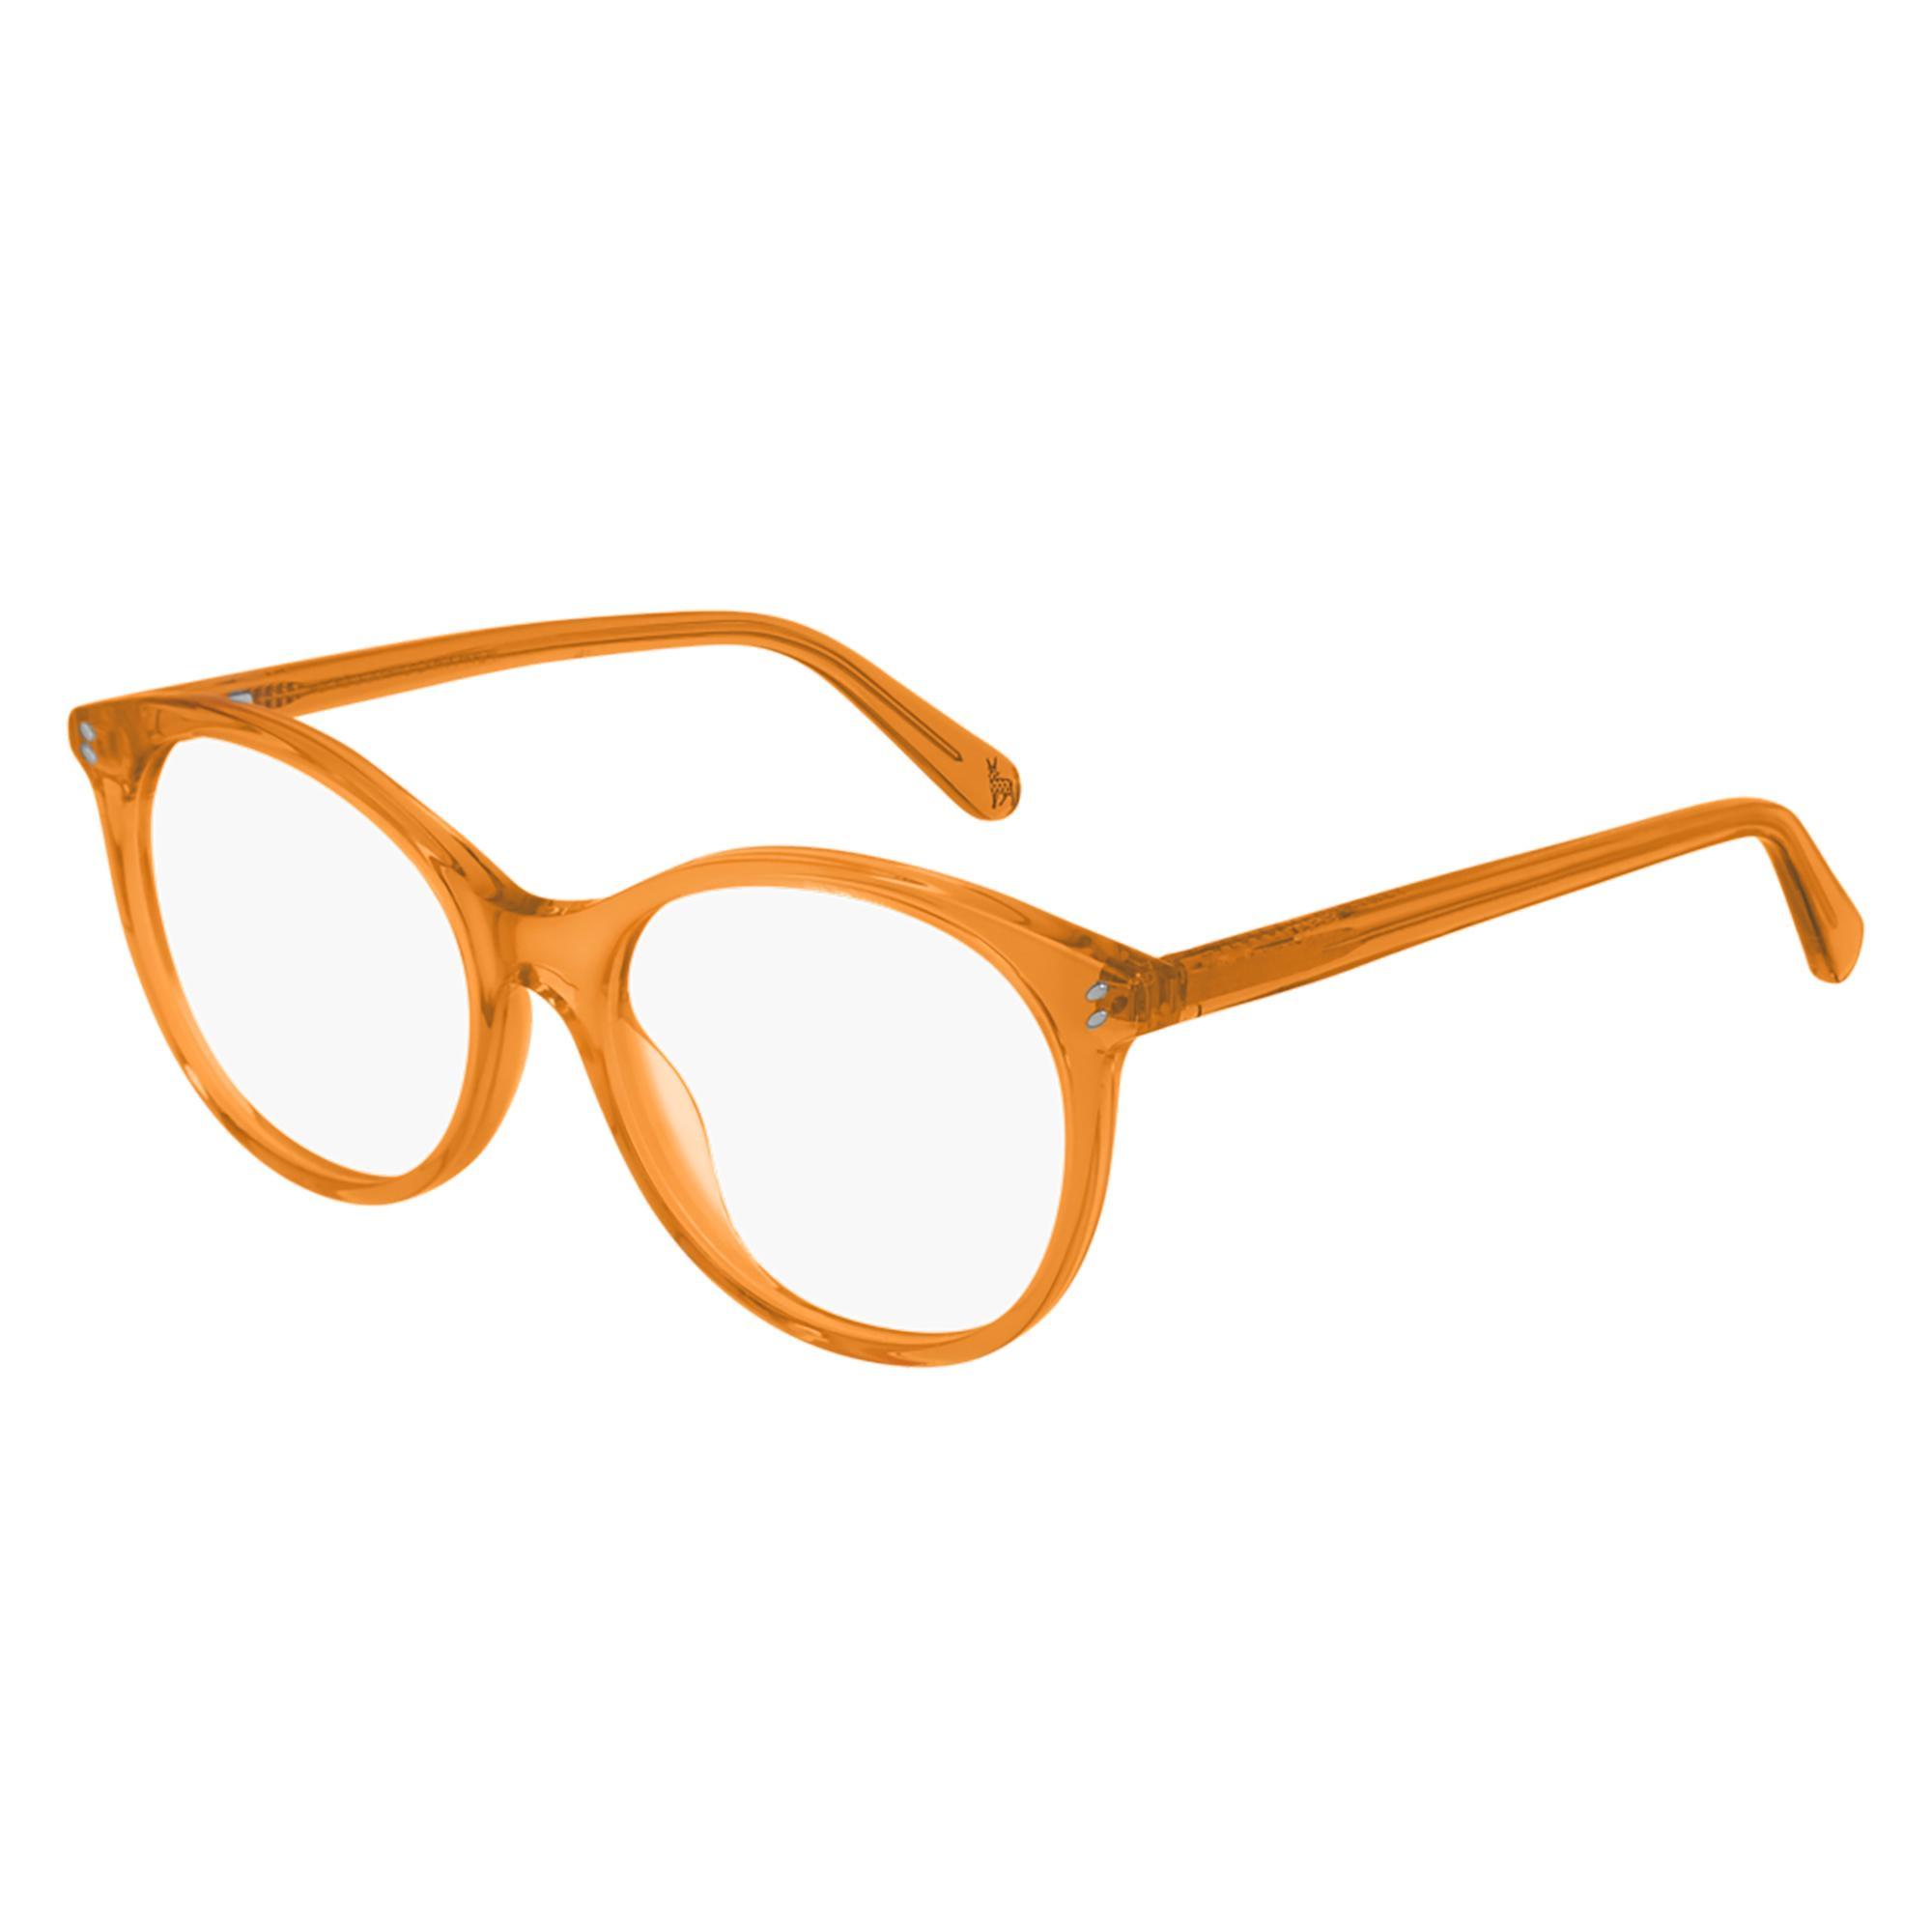 003 orange orange transpa